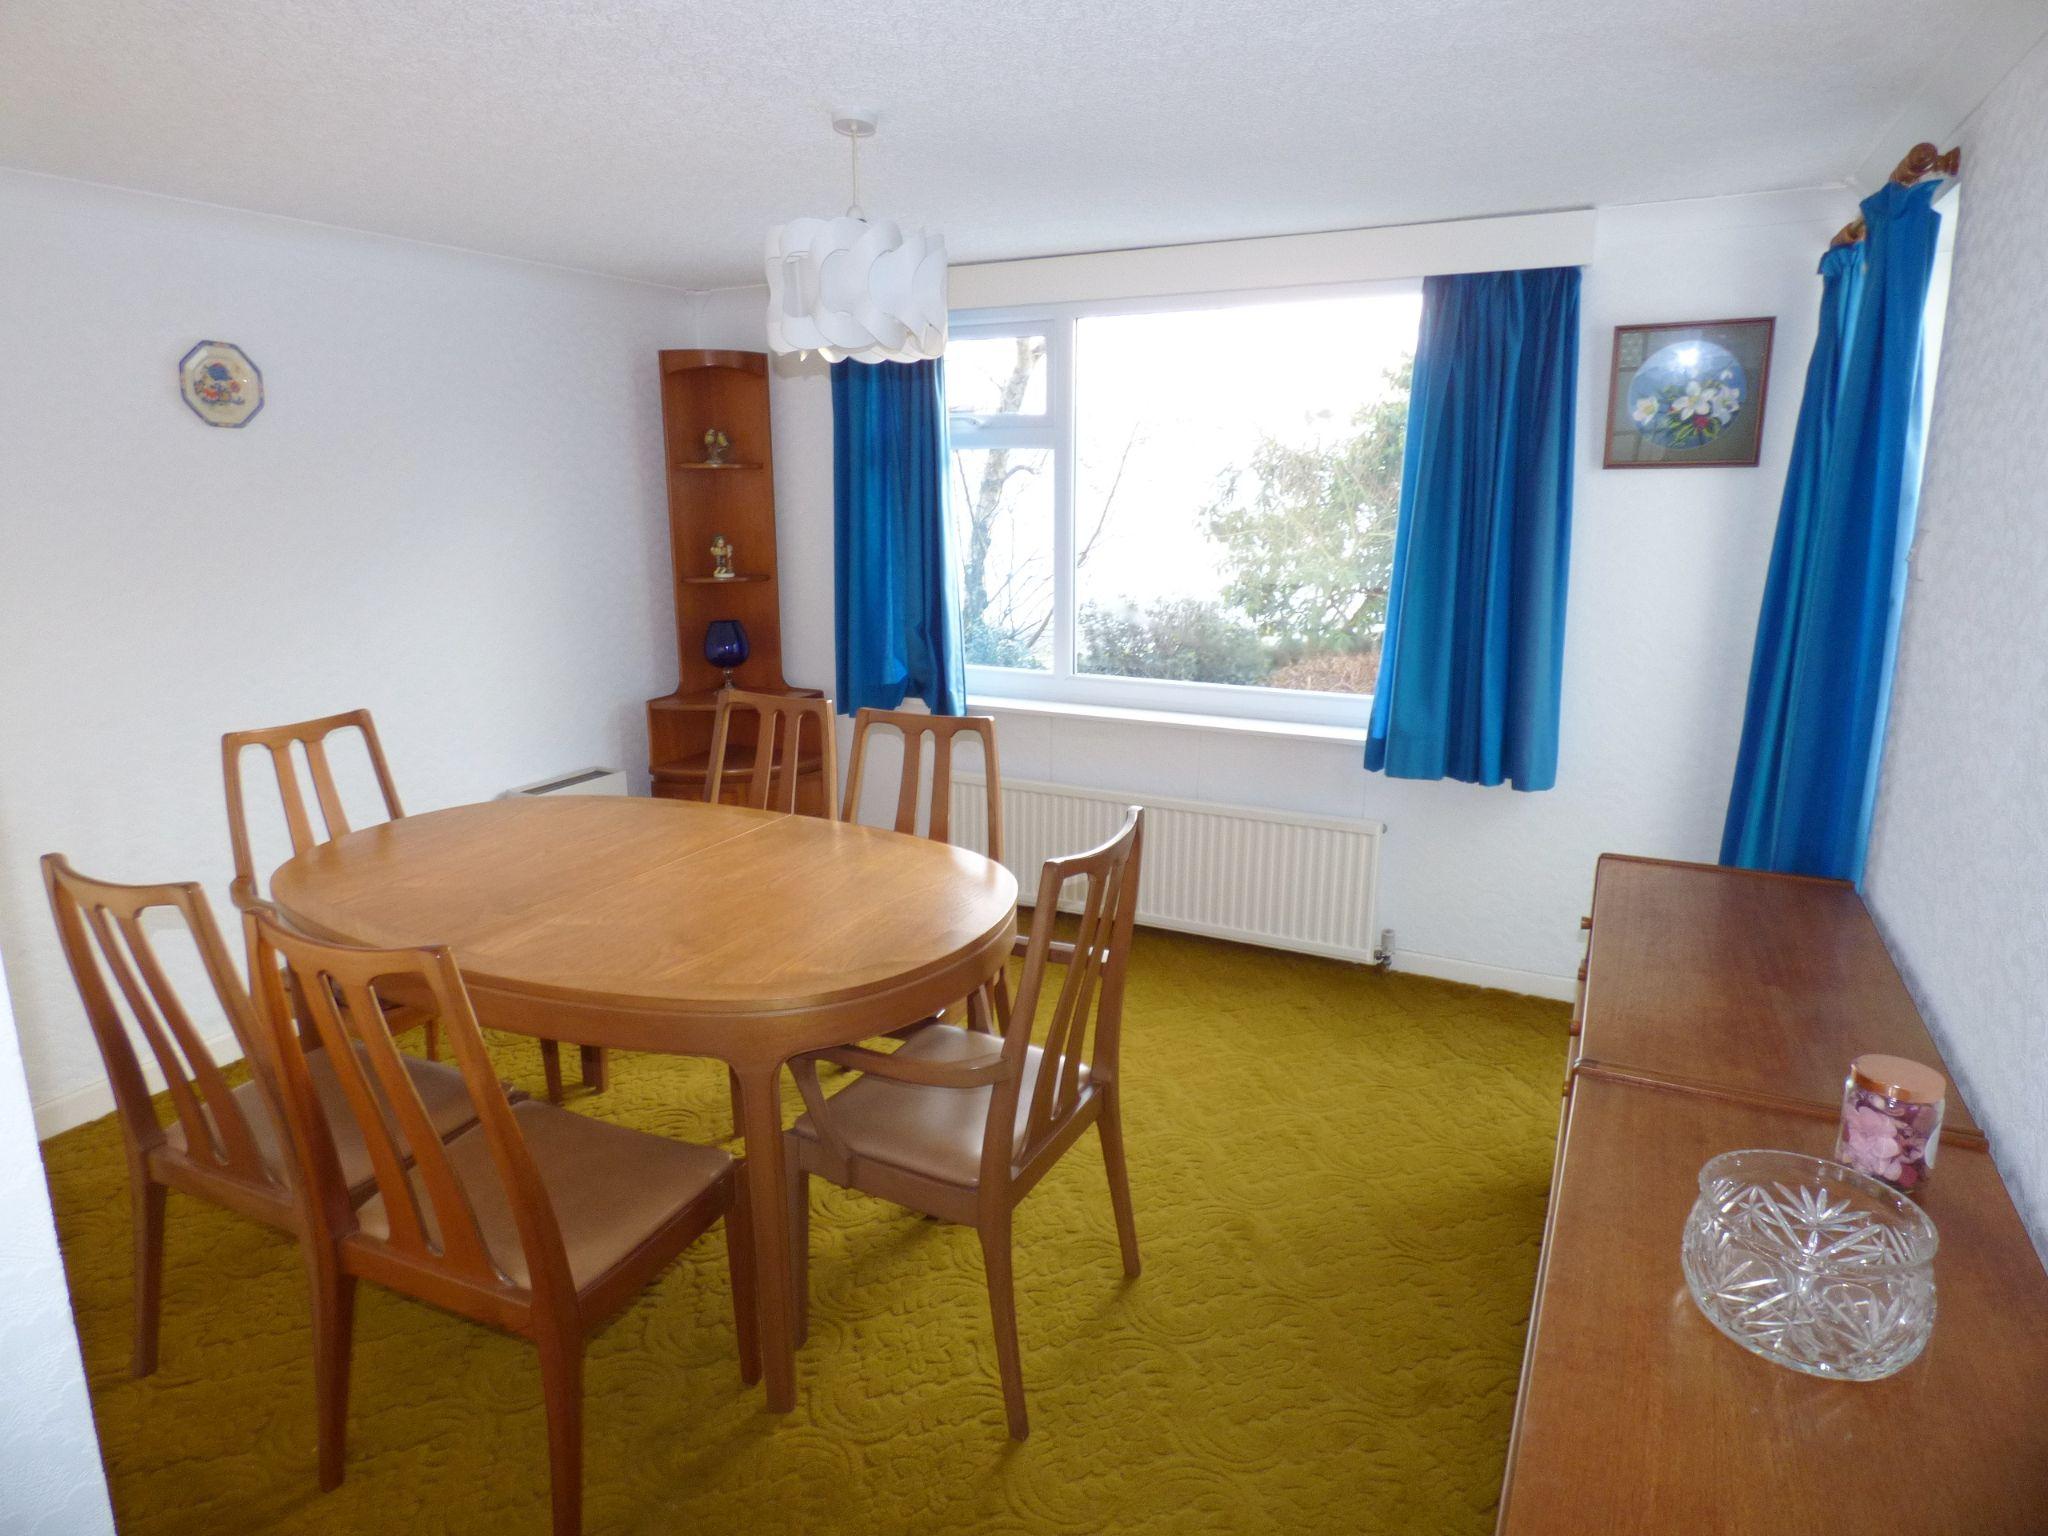 3 Bedroom Detached Bungalow For Sale - Dining Room / Bedroom Three